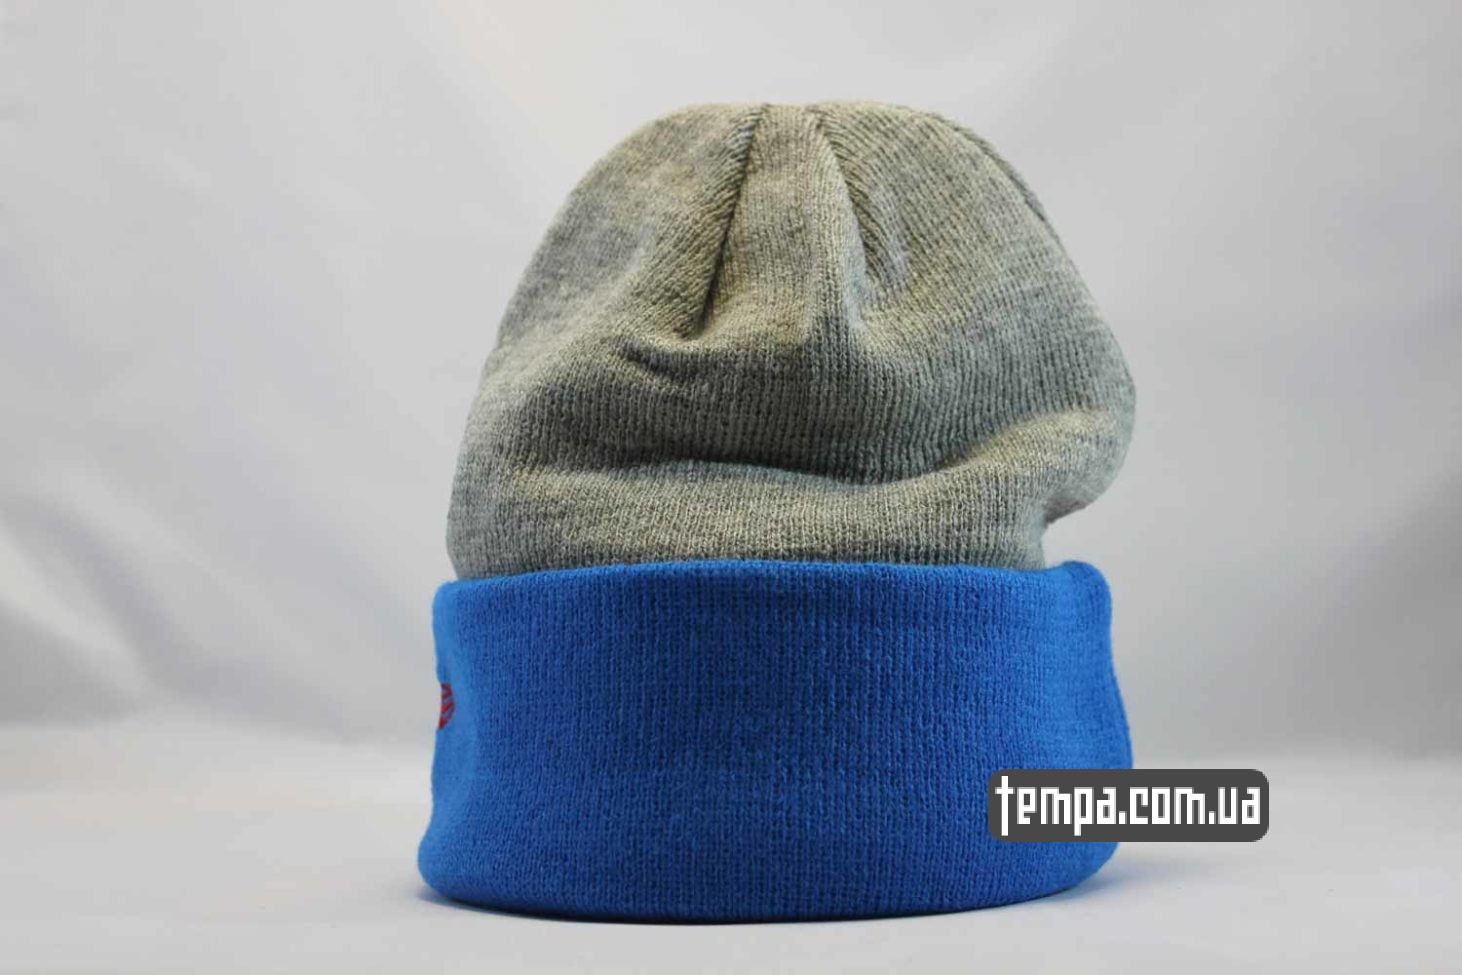 нью эра зимняя одежда шапка beanie SUPERMAN NewEra синяя серая